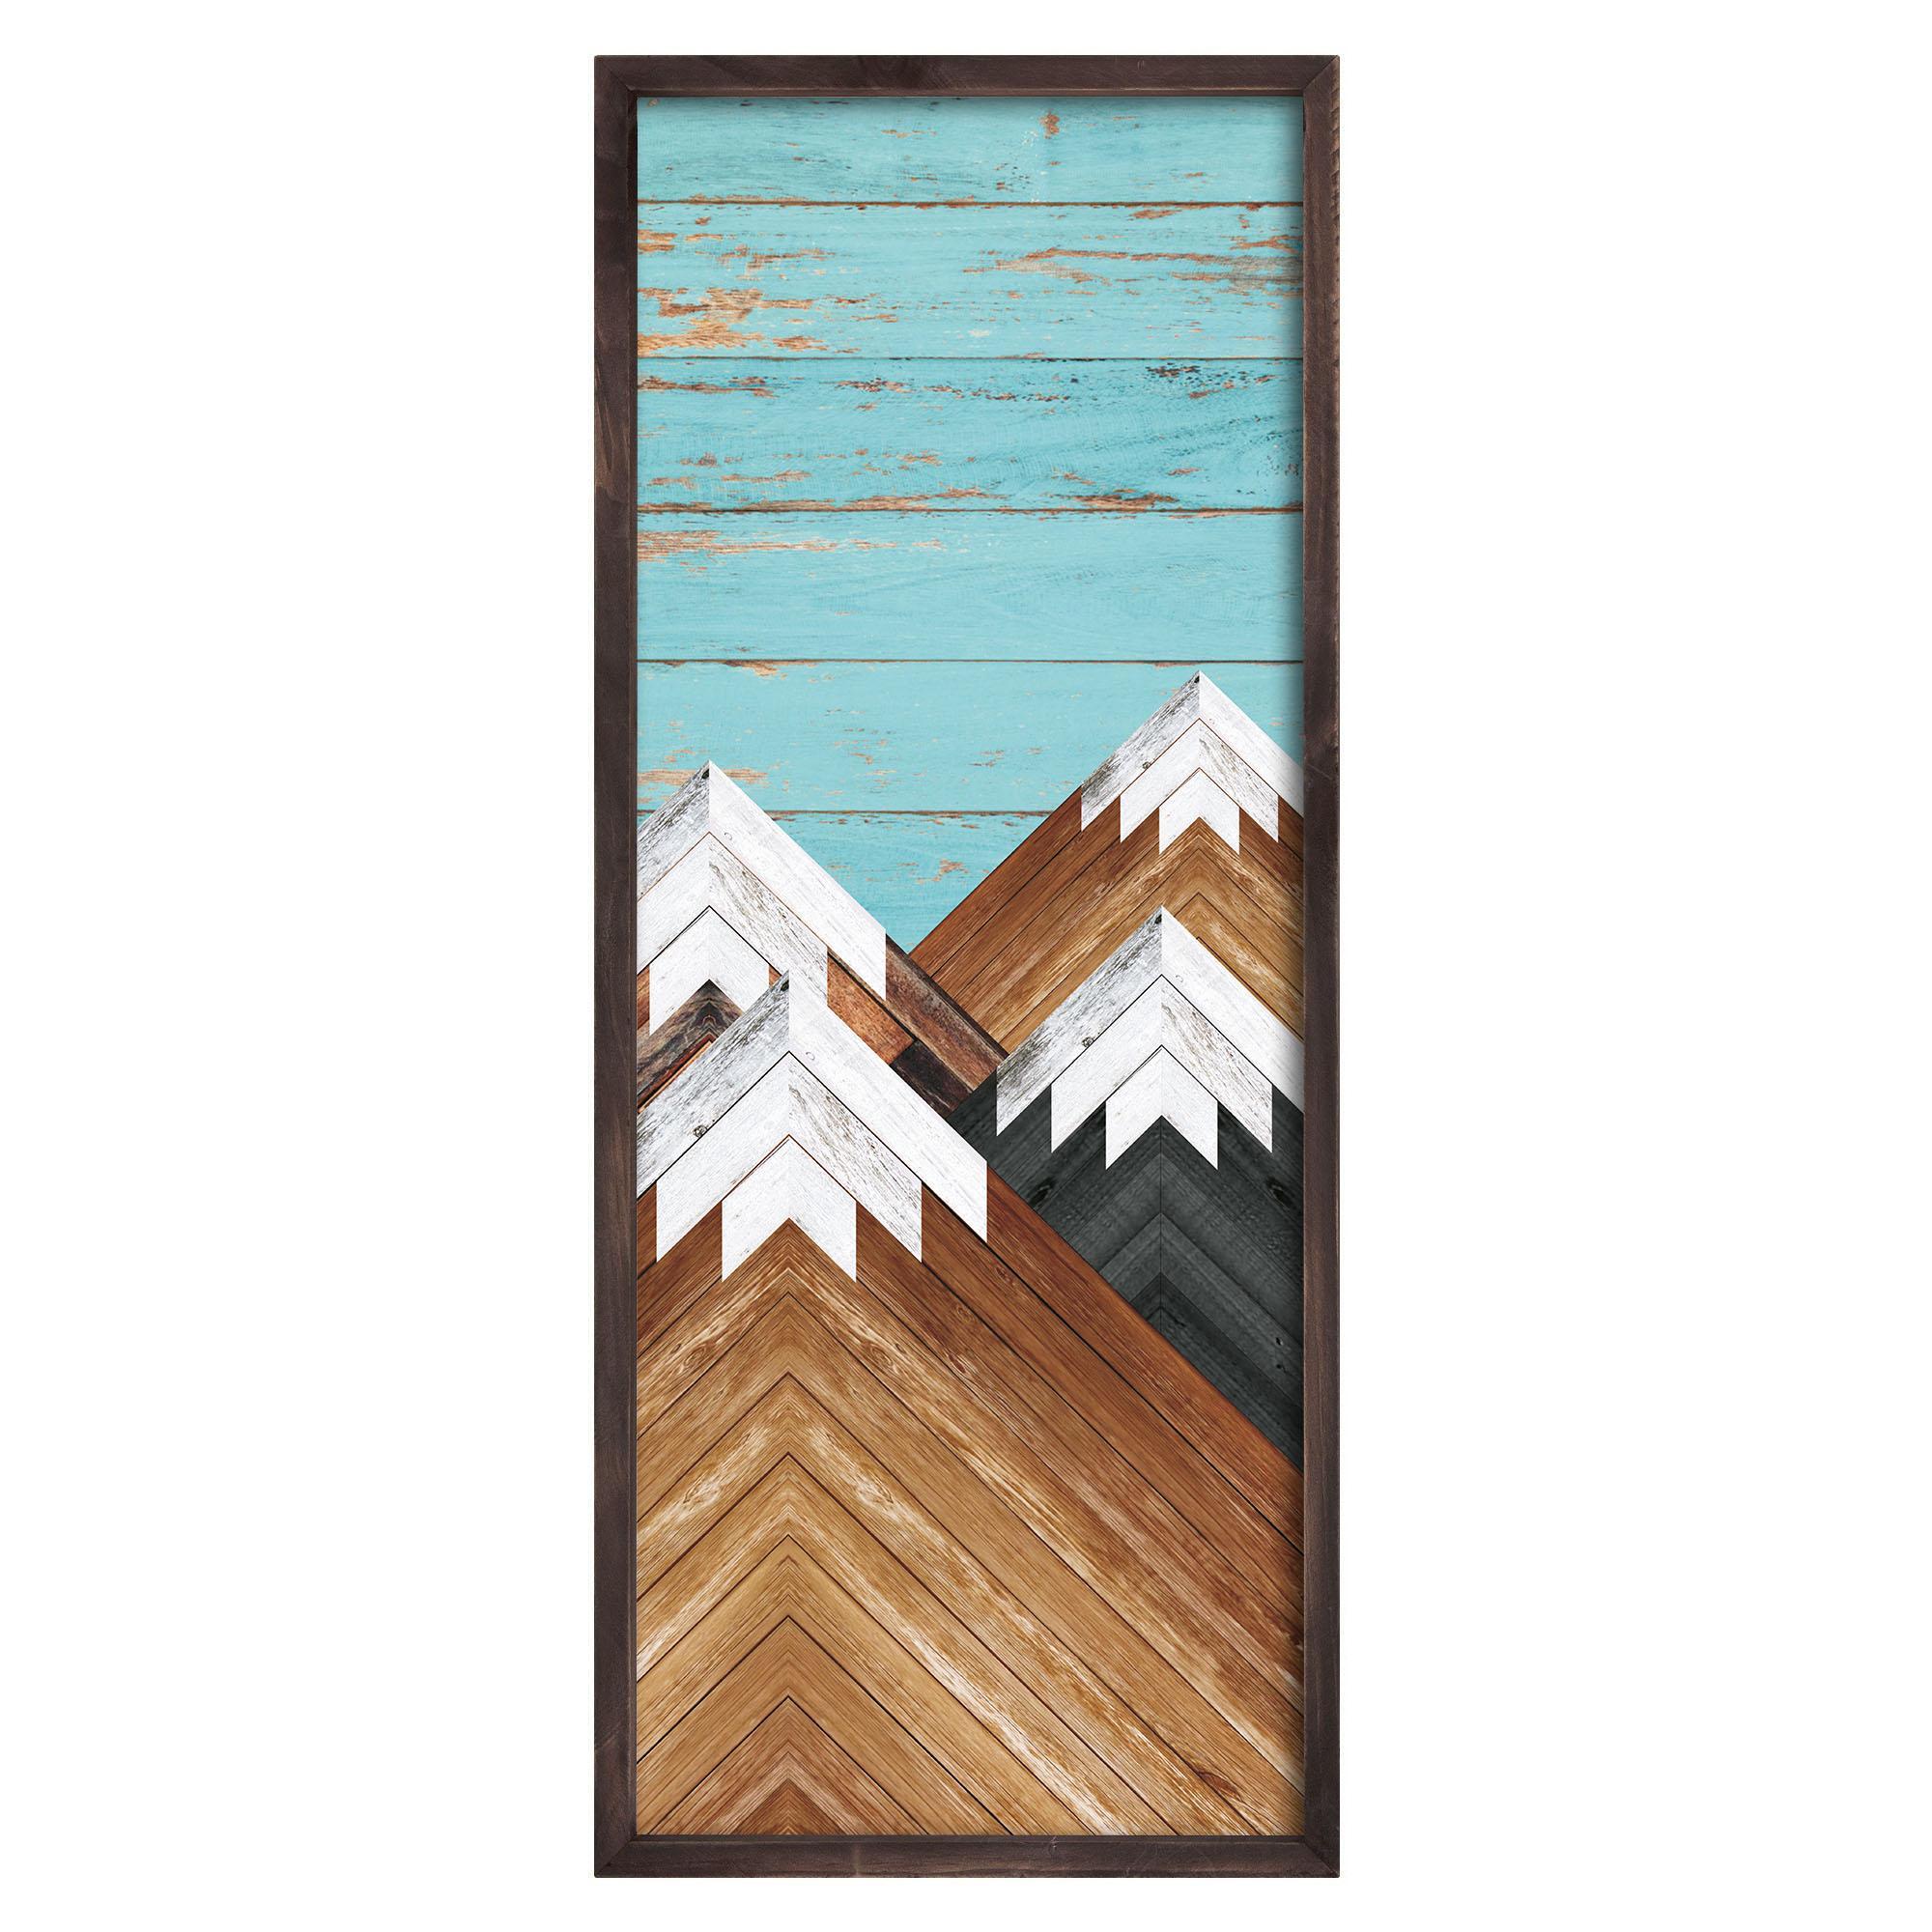 Tablou 40x120 cm - Oyo Concept, Multicolor imagine